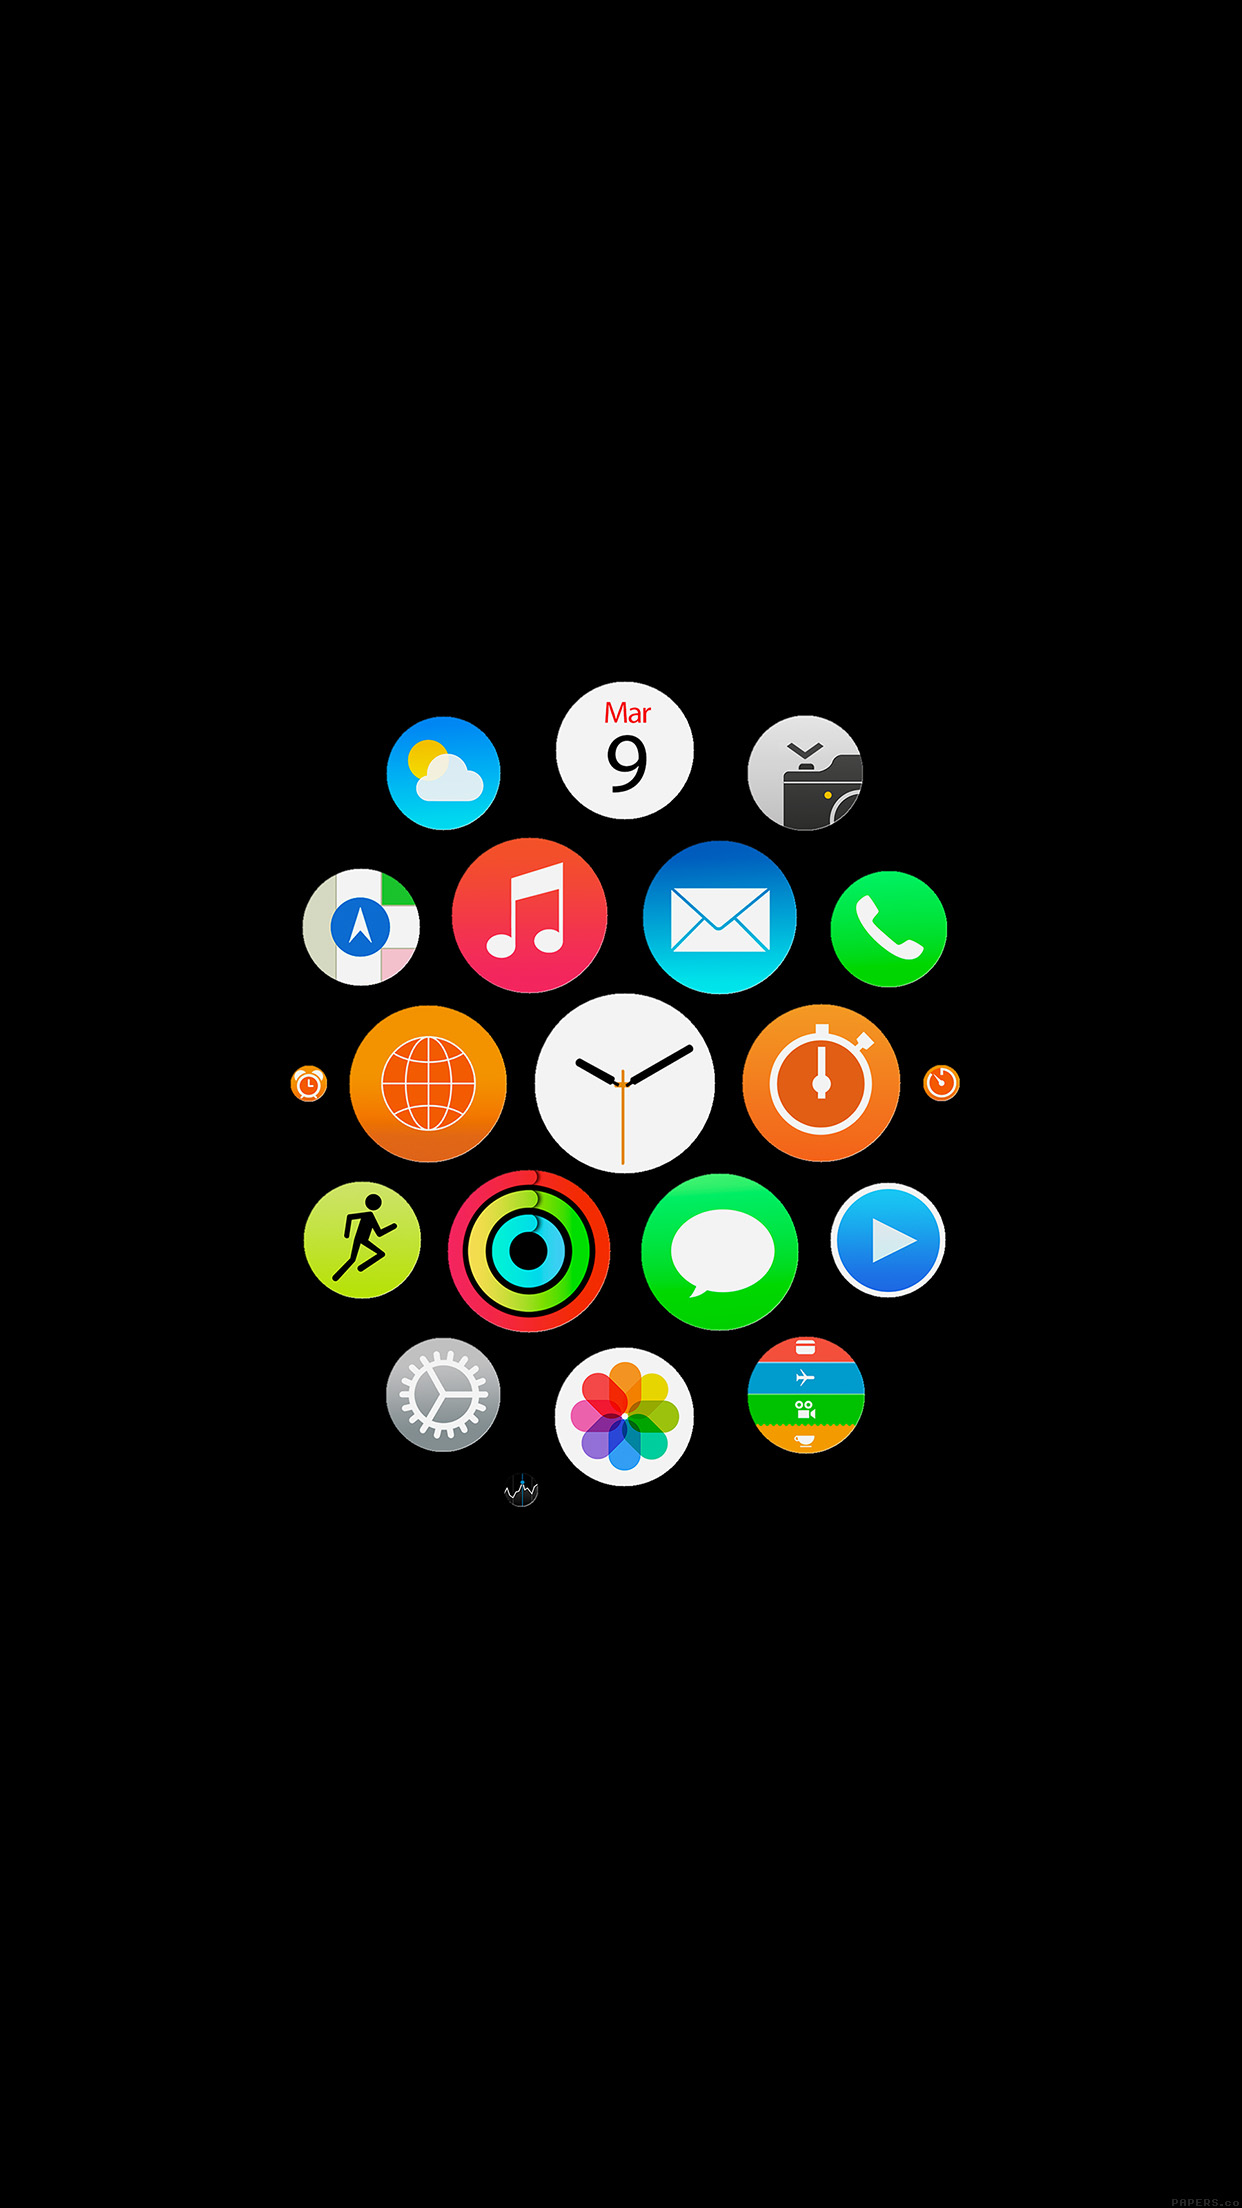 iPhone21papers   ak21 apple watch icons art illust dark